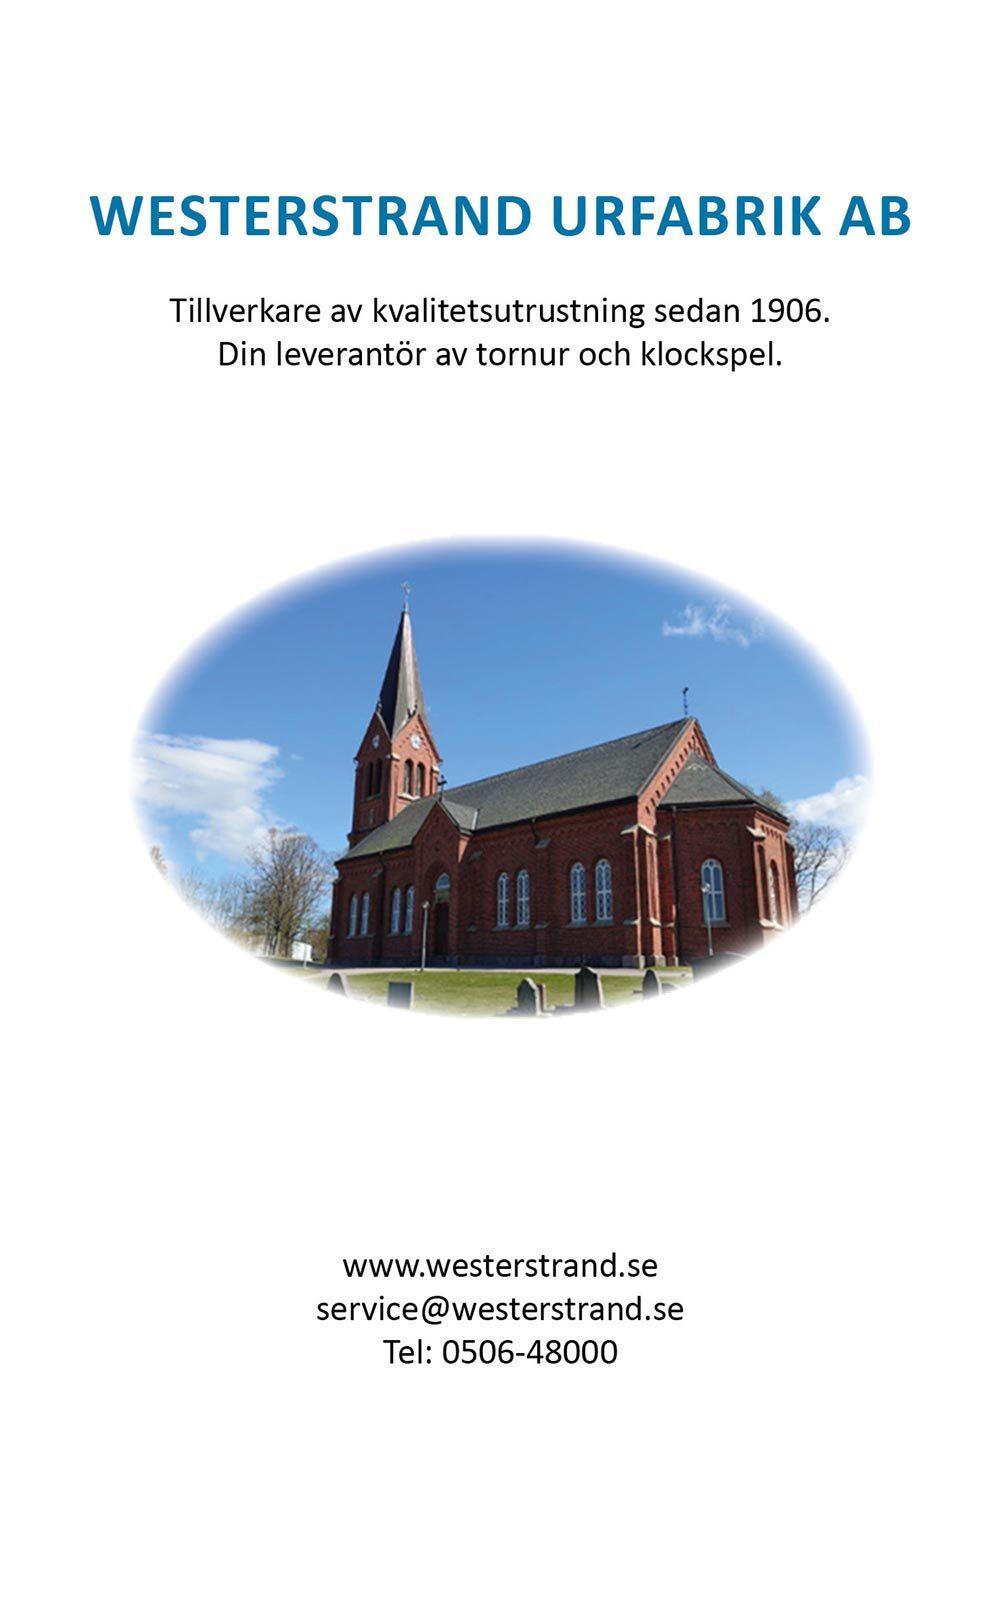 Westerstrand_Urfabrik_2021.jpg